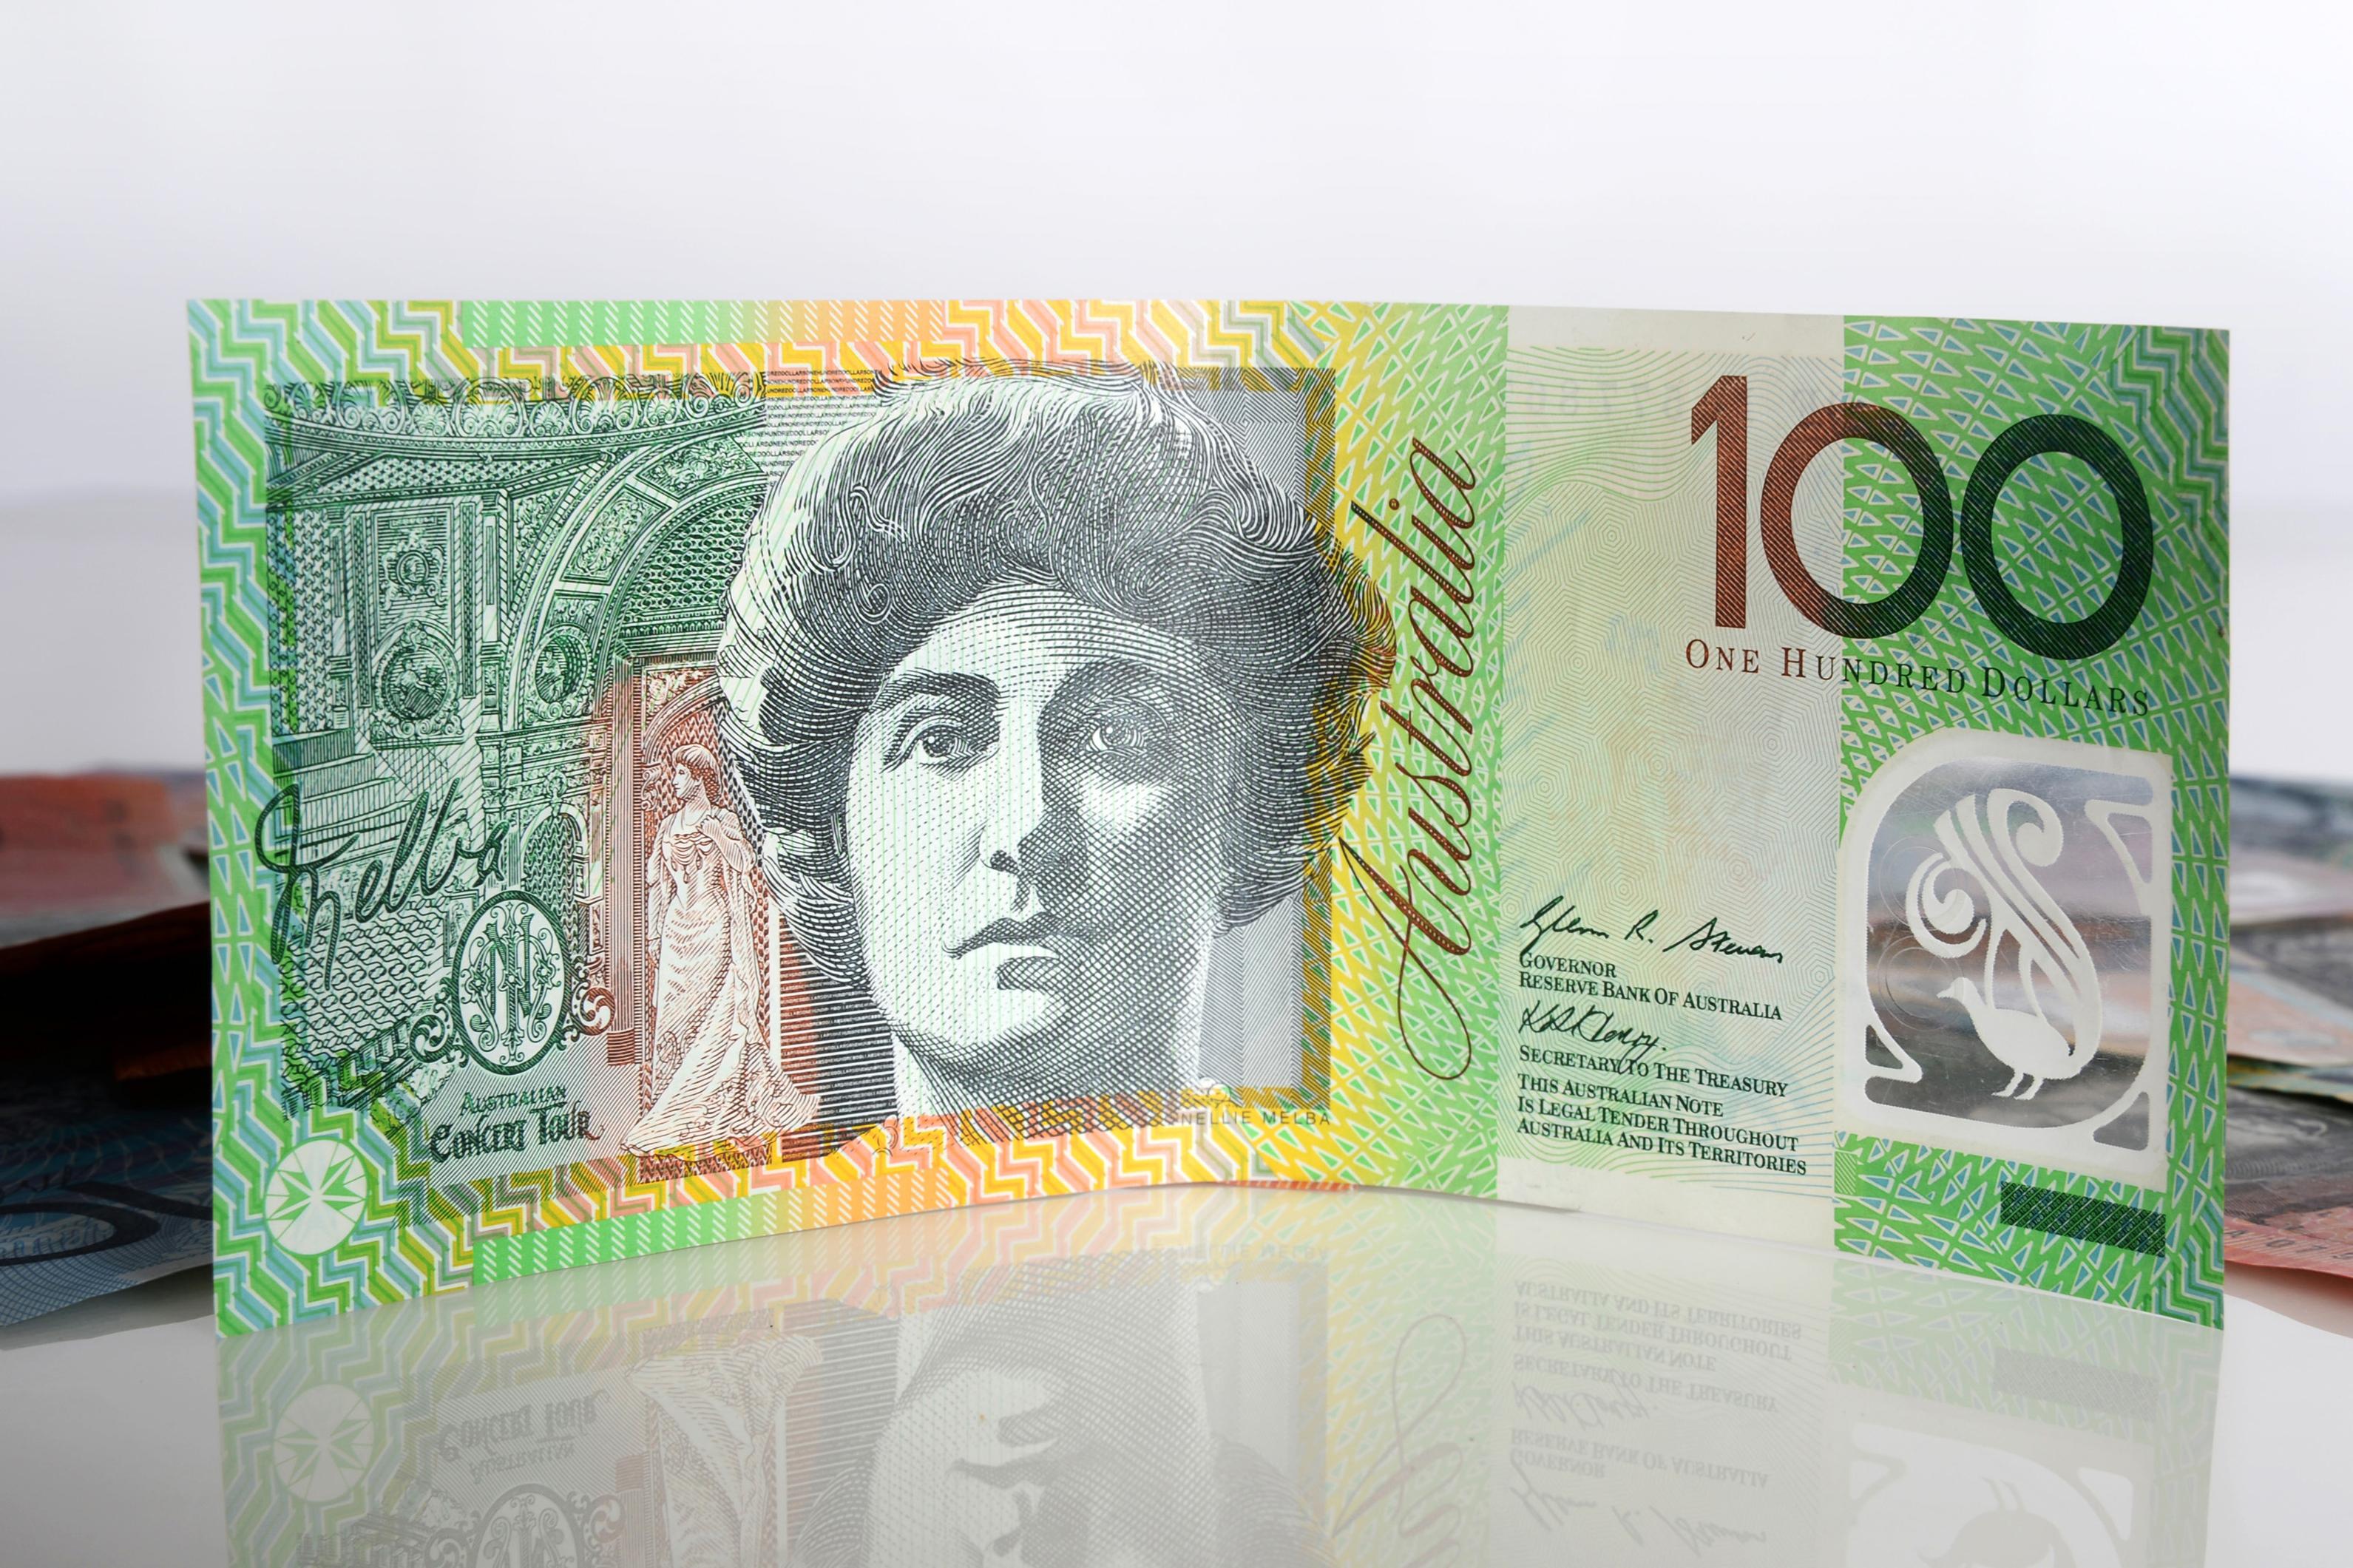 An Australian one-hundred dollar banknote